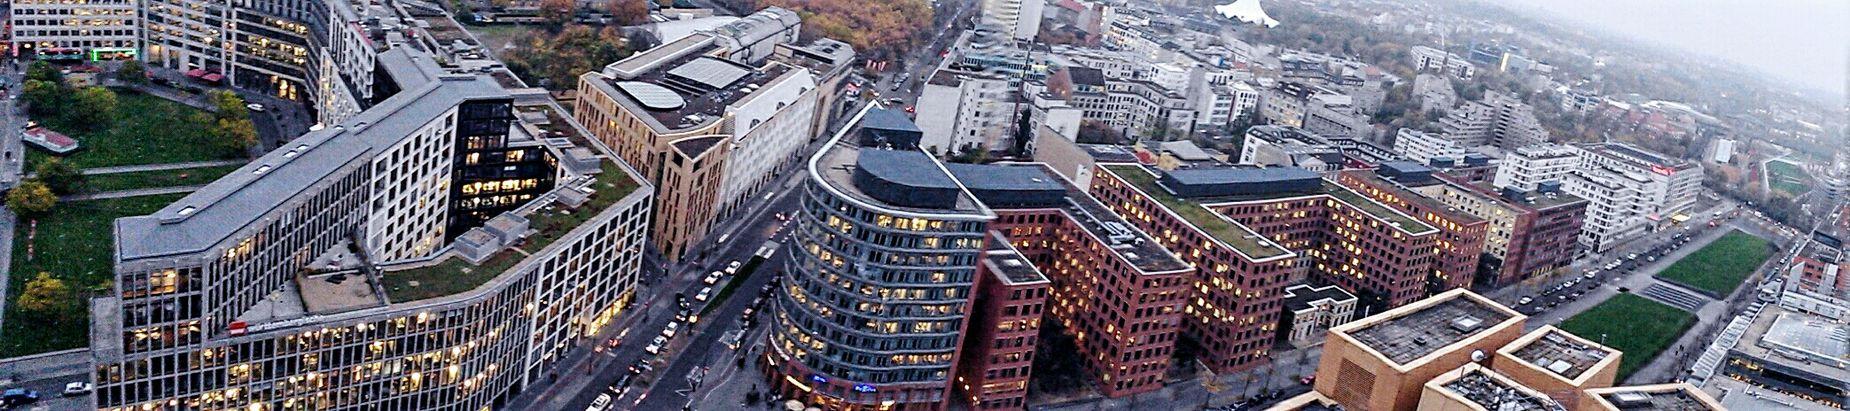 Urbanphotography Berlin Urban Landscape